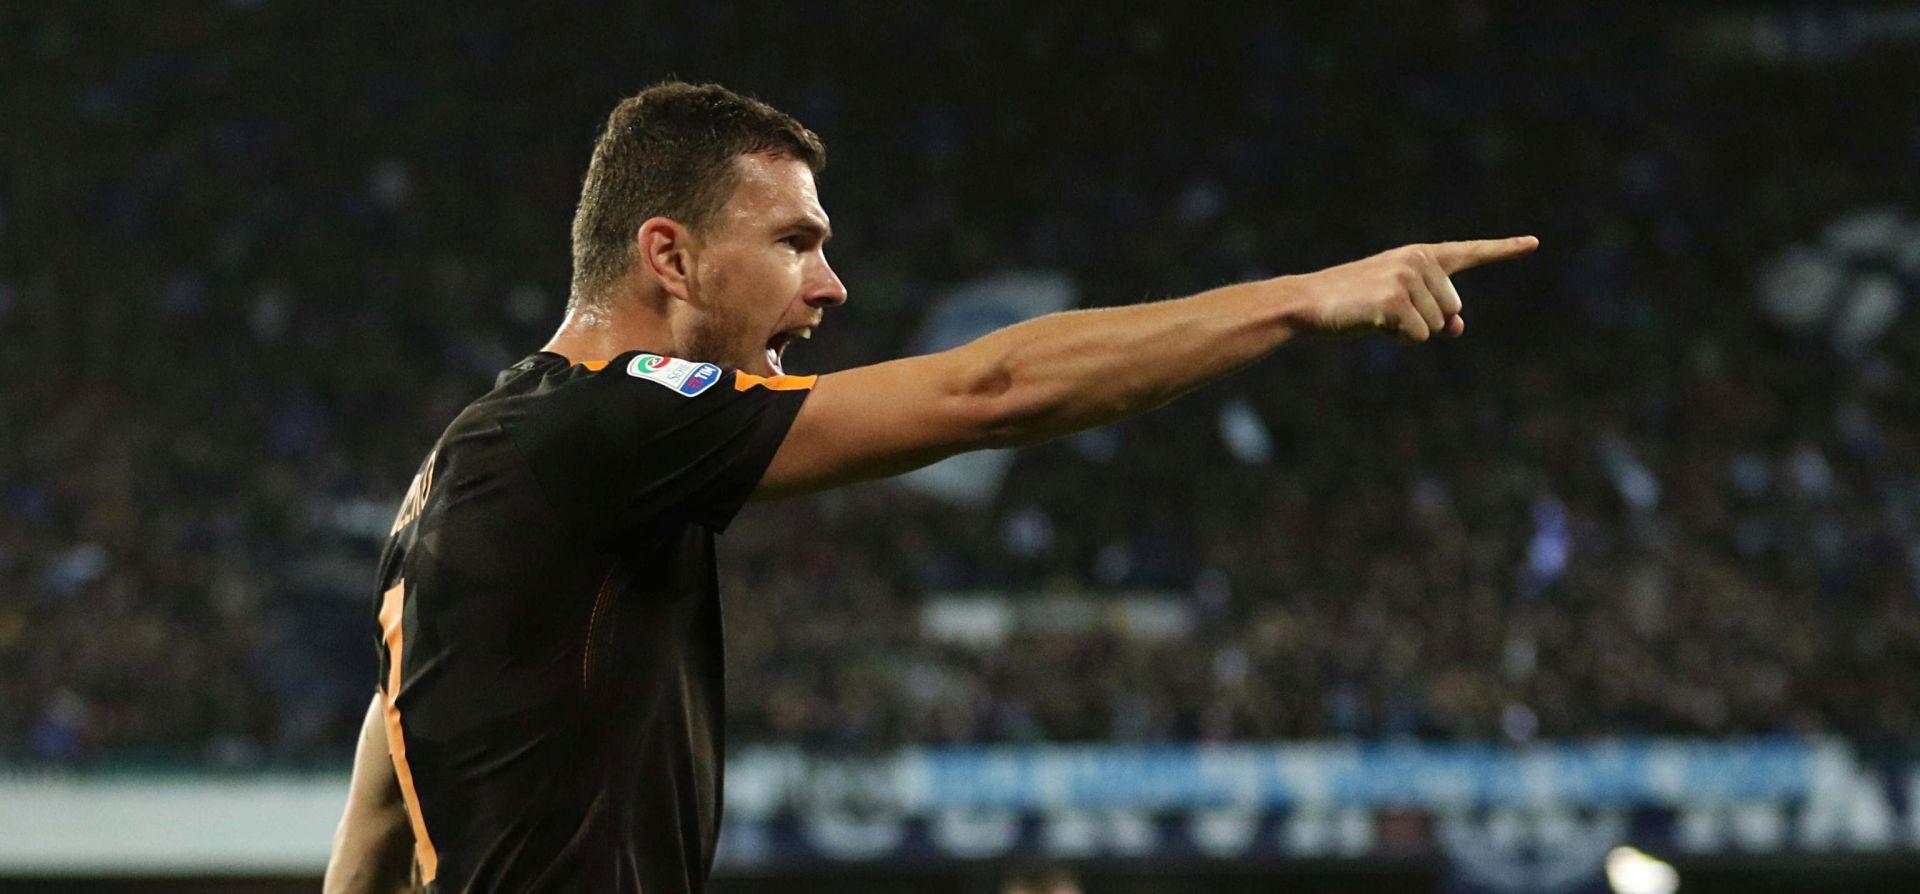 Mo protiv bivšeg kluba, Roma nade polaže u Džeku